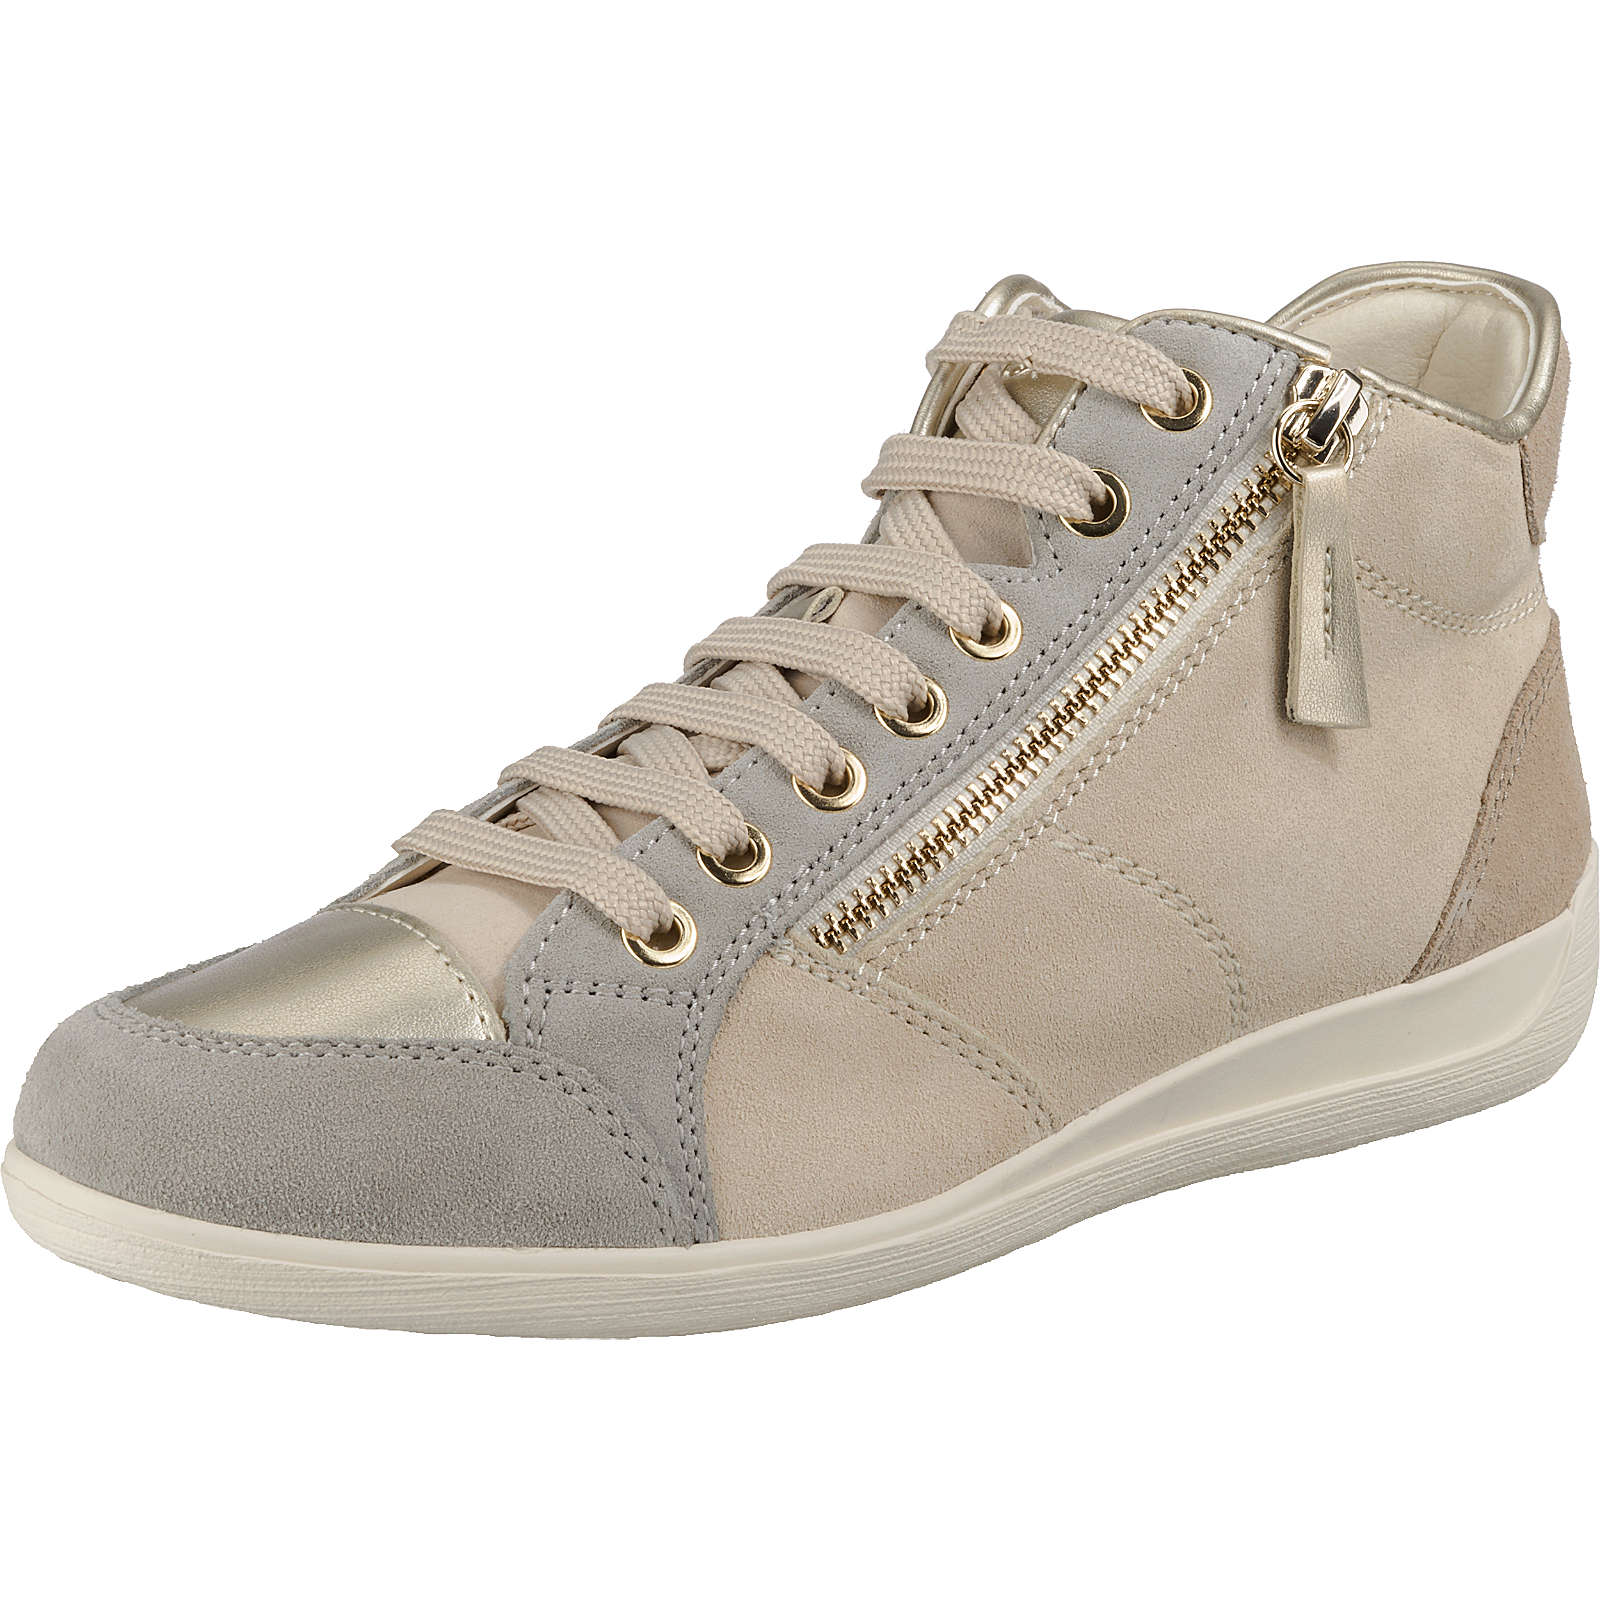 GEOX Sneakers High creme Damen Gr. 40